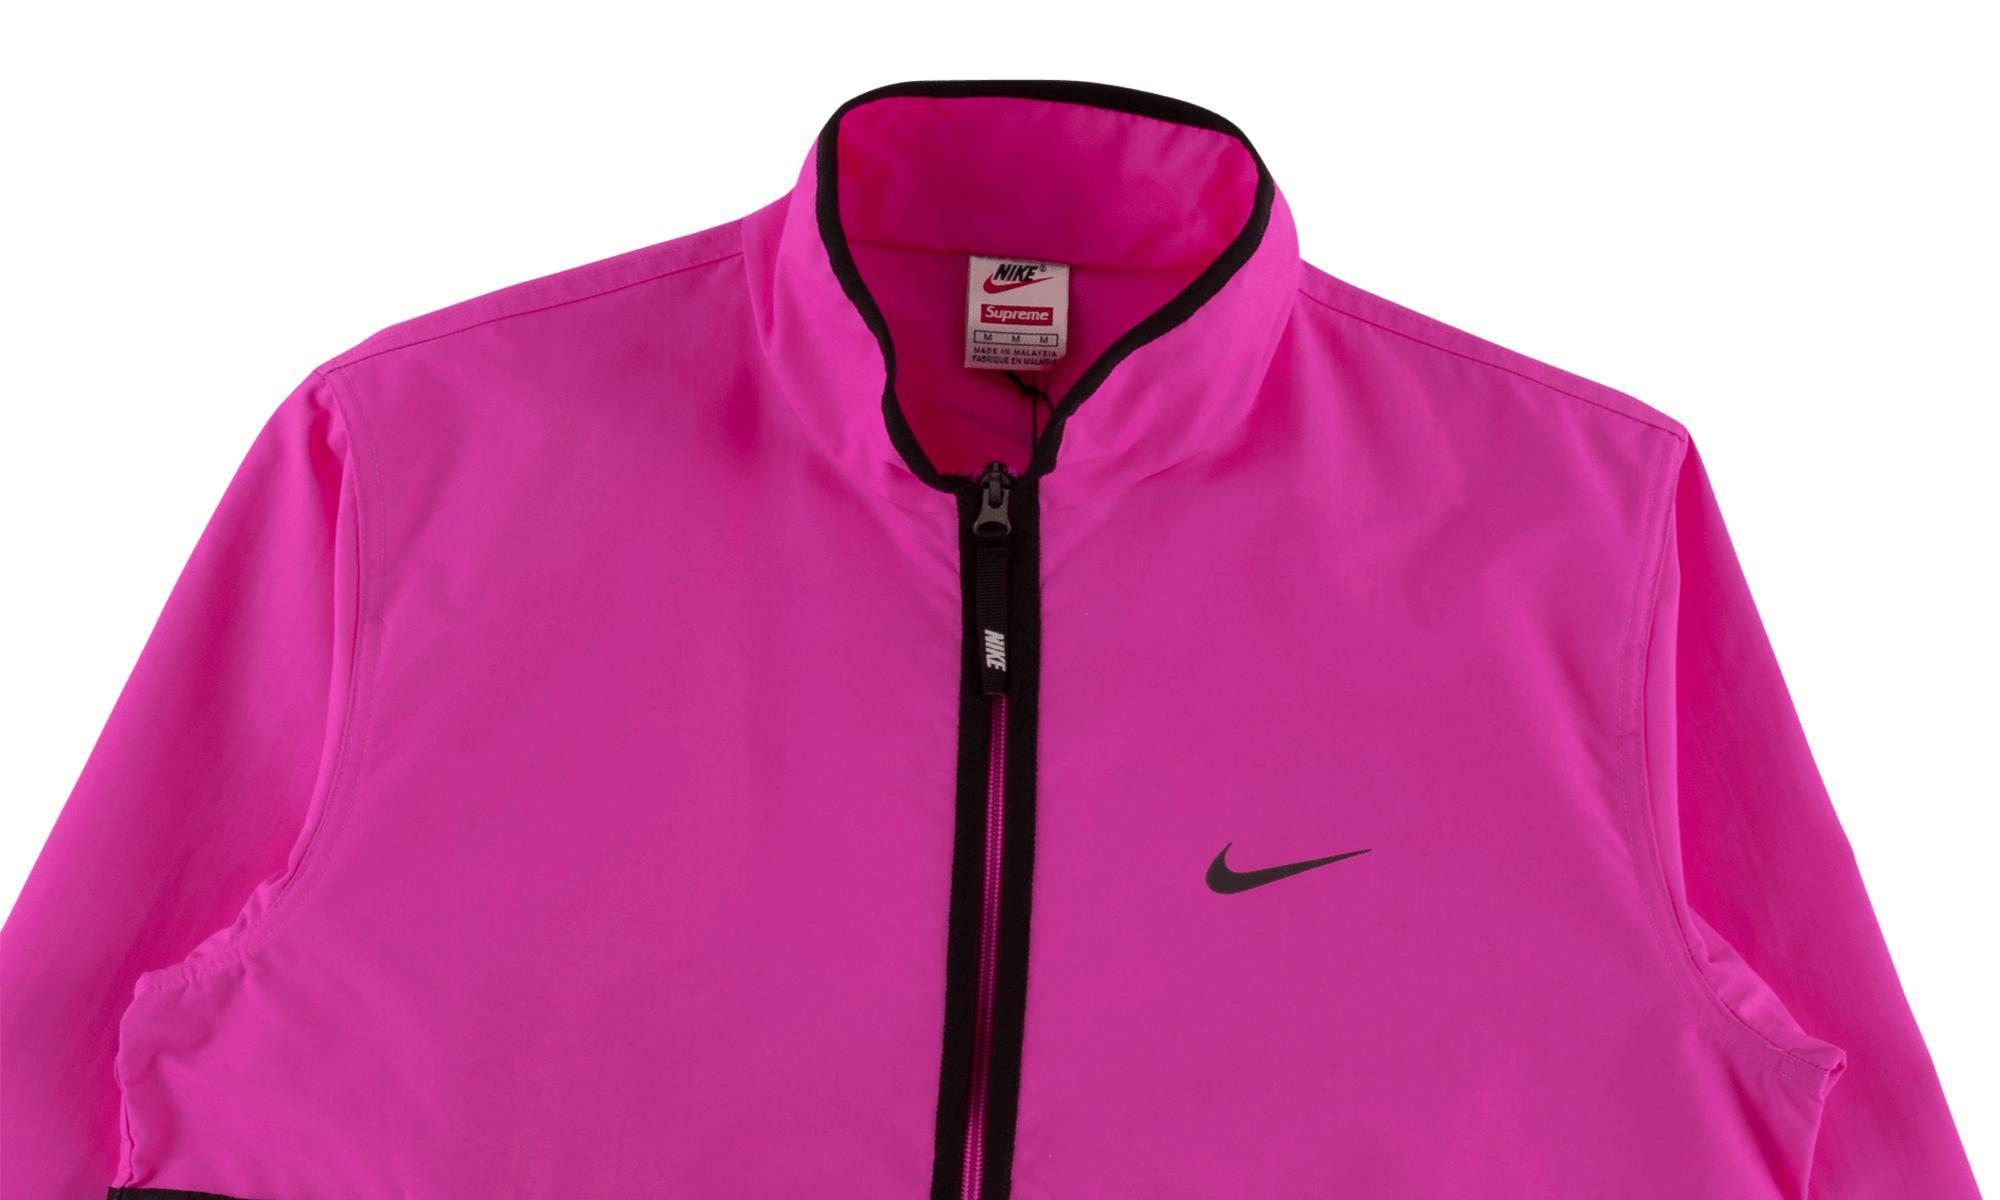 34dc5ae9 Supreme - Pink Nike Trail Running Jacket for Men - Lyst. View fullscreen